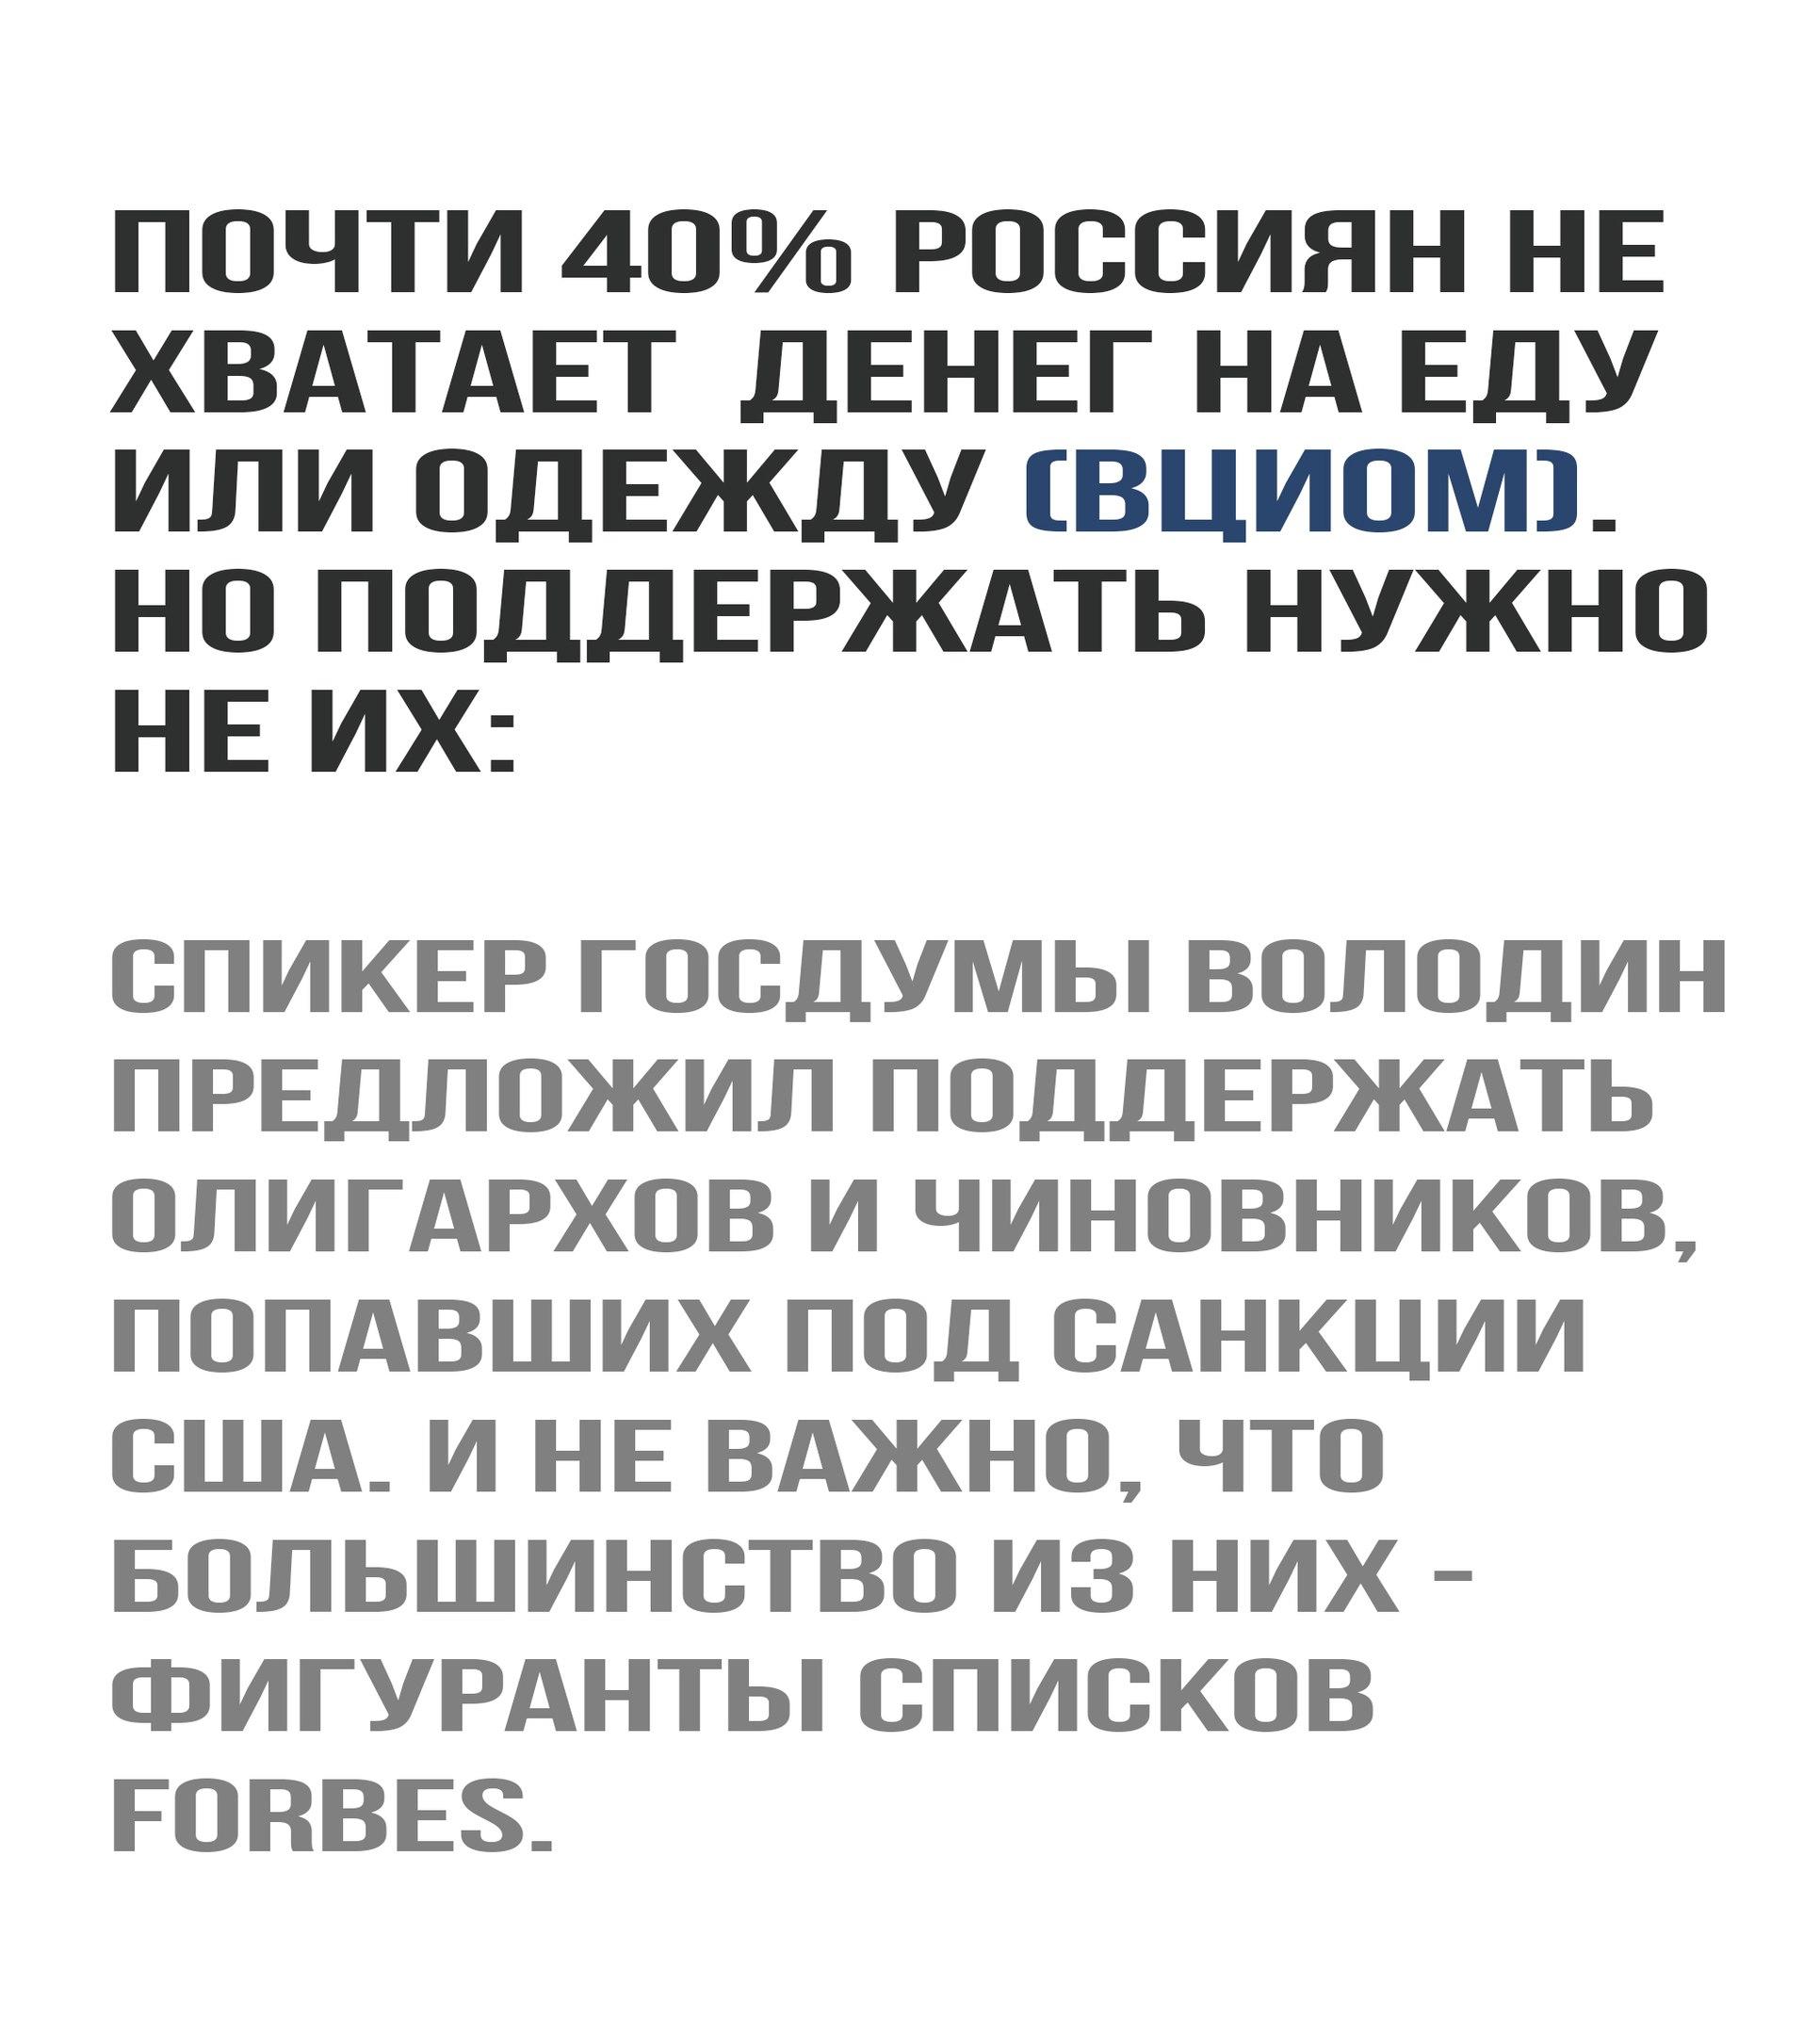 https://pp.userapi.com/c847218/v847218050/1ce23/hjOMmjO2g-E.jpg